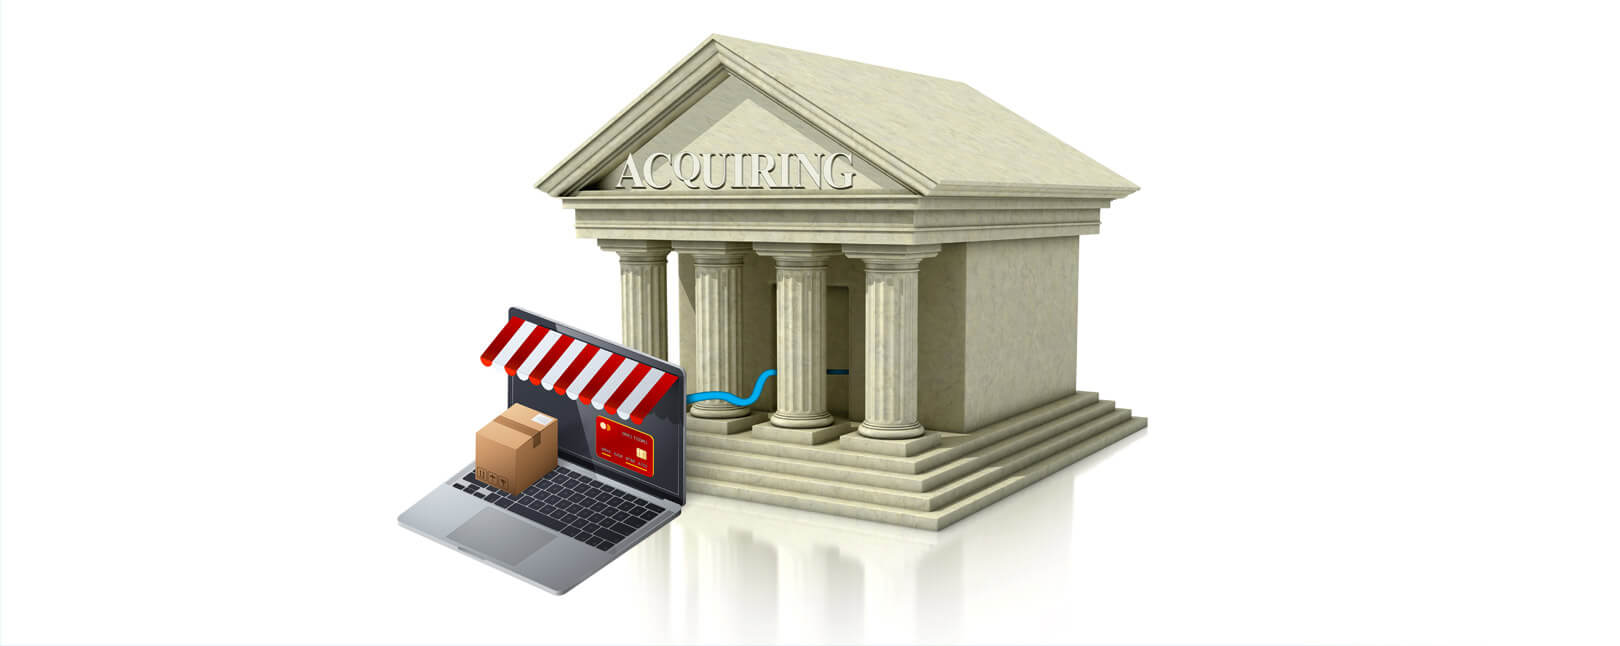 Acquiring Bank